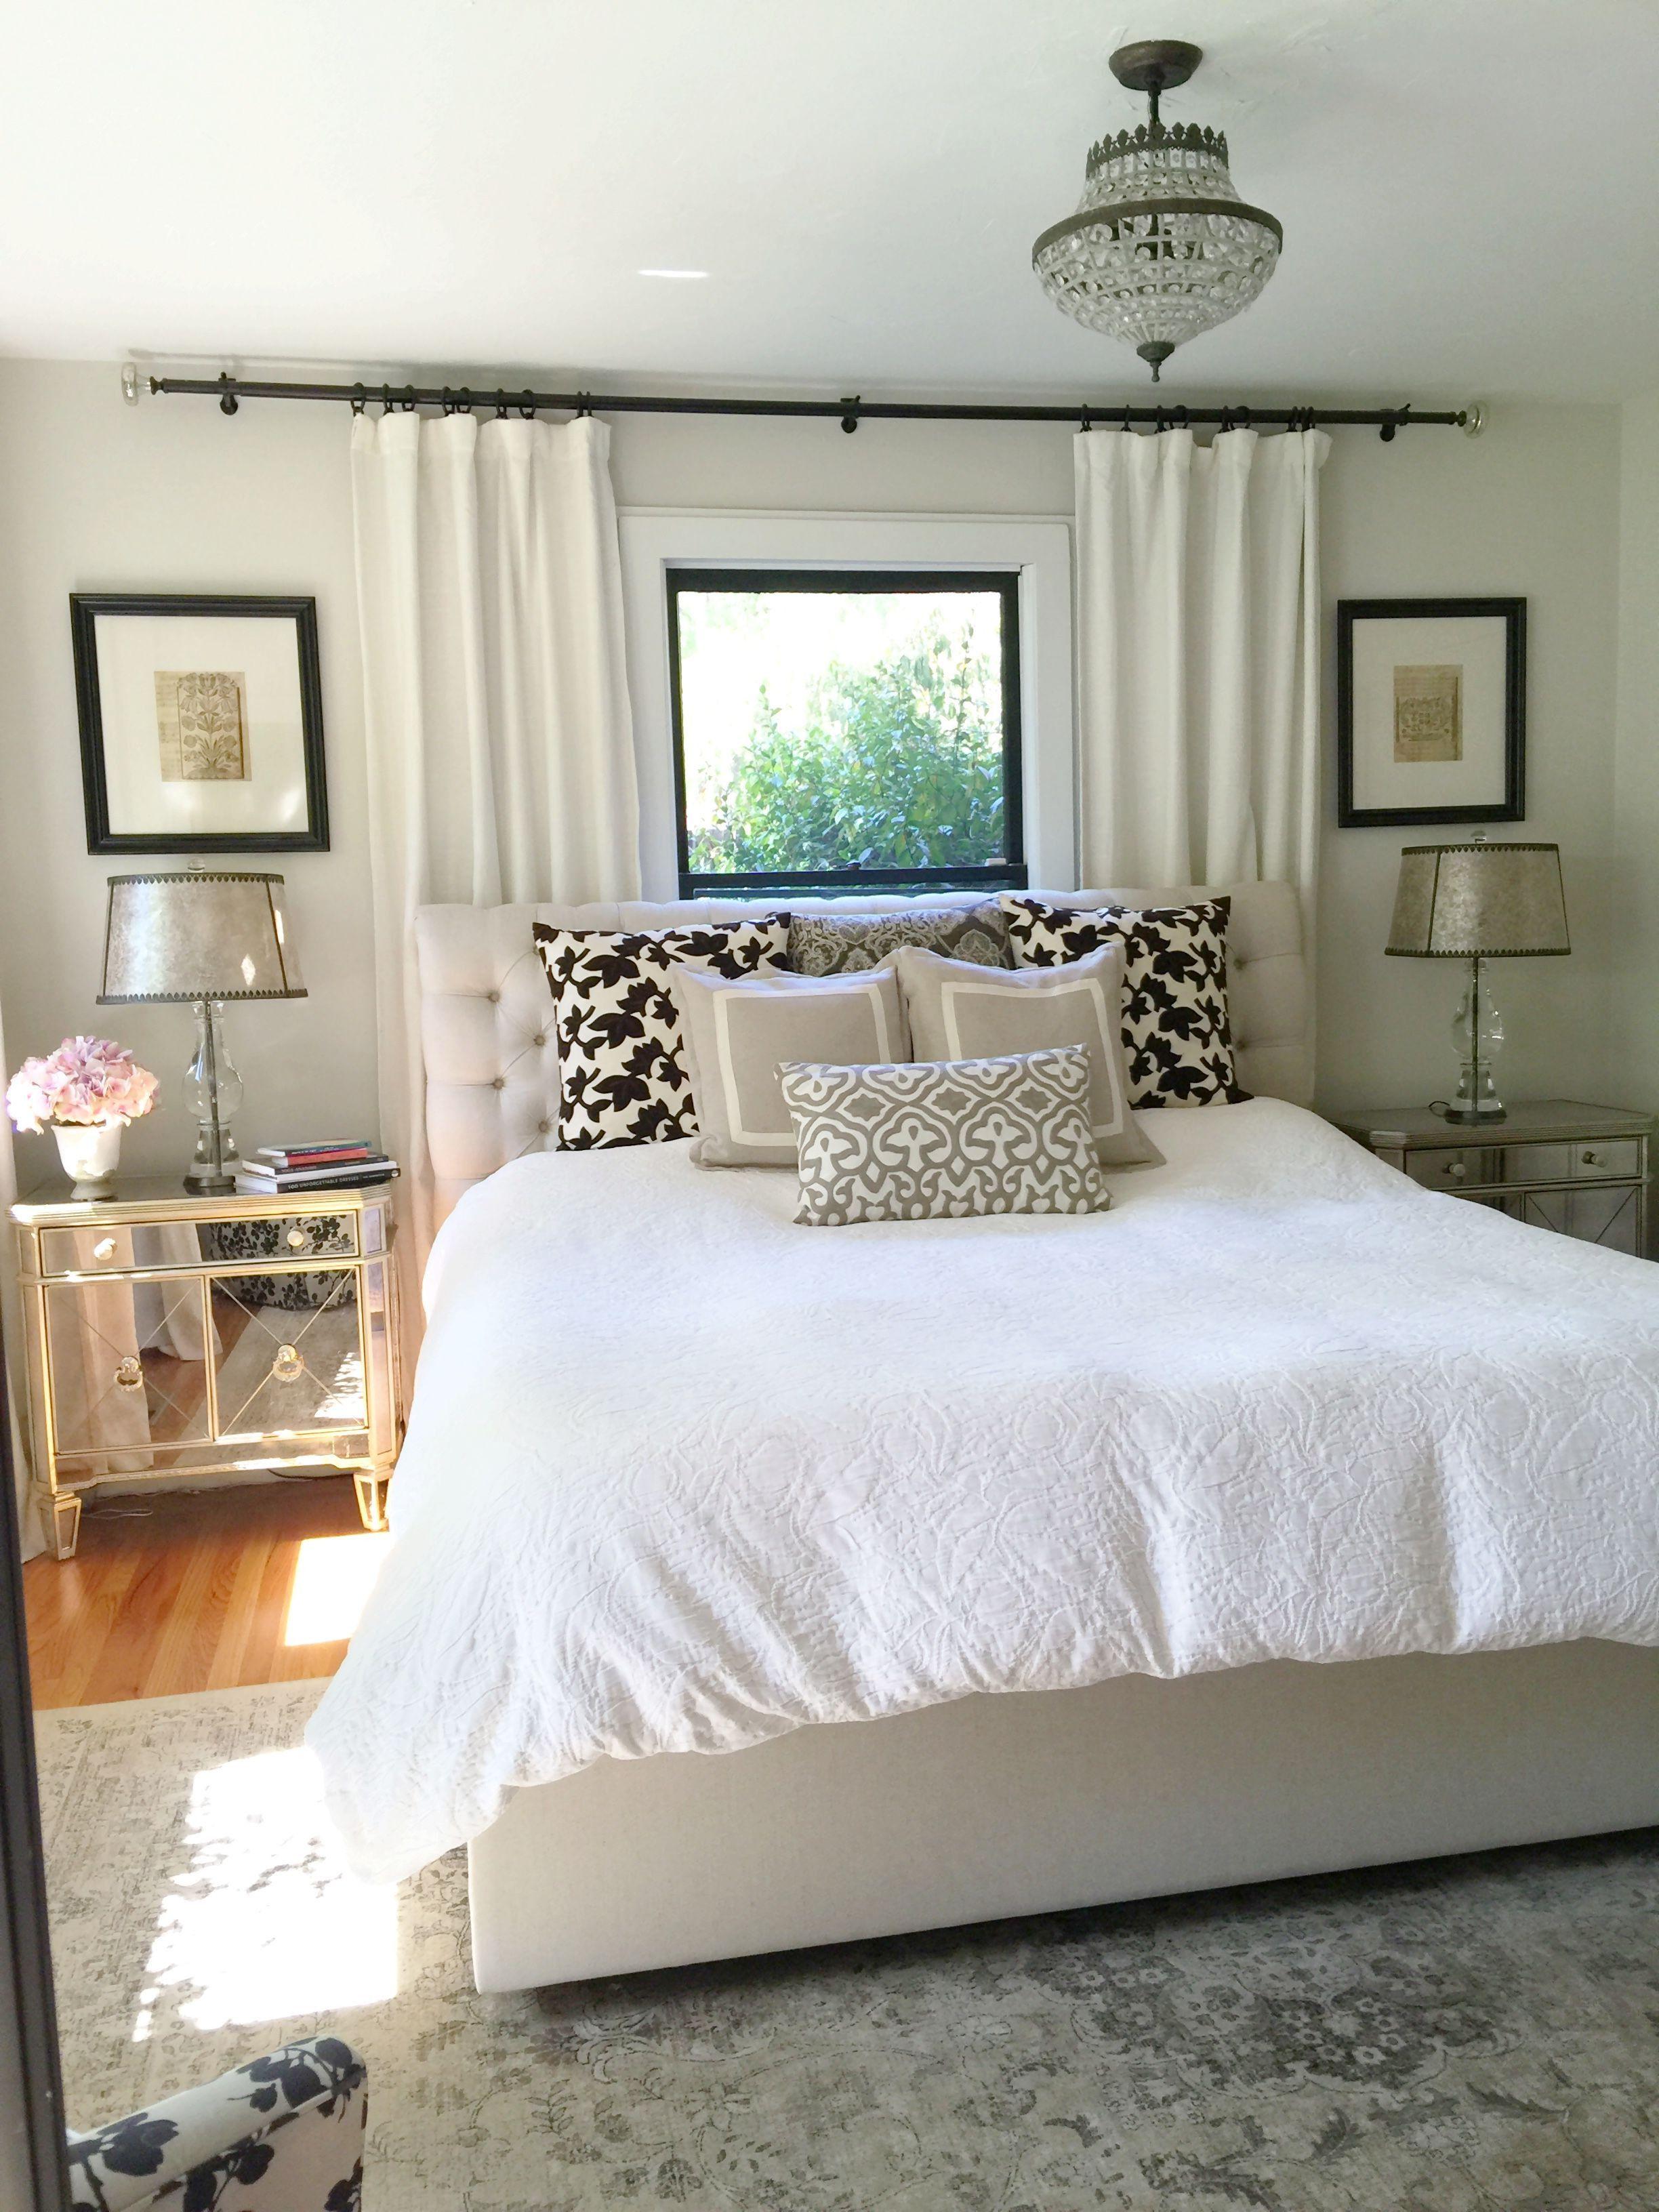 Pin By Salama Mcfarland On Fave Bedroom Decor Bedroom Interior Master Bedroom Furniture Home Decor Bedroom